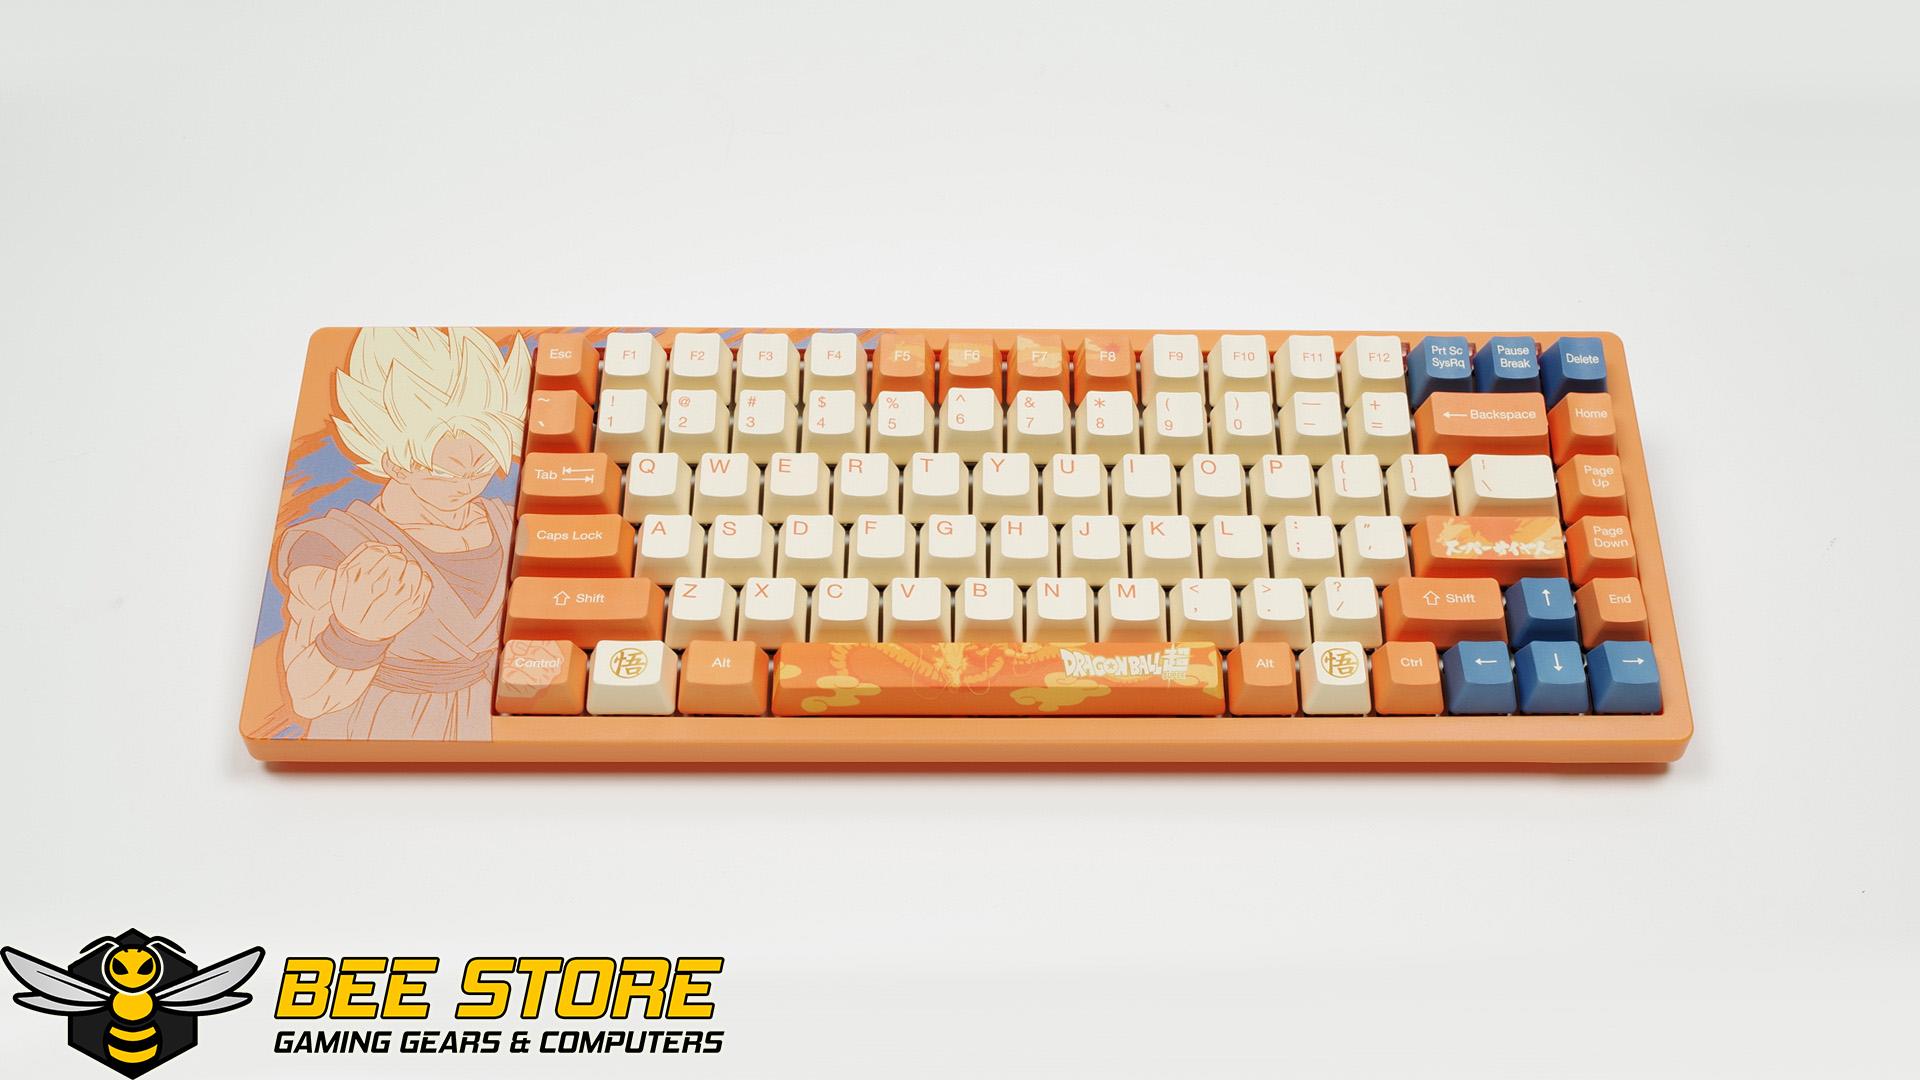 akko-3084-acg84-goku-beegaming-01